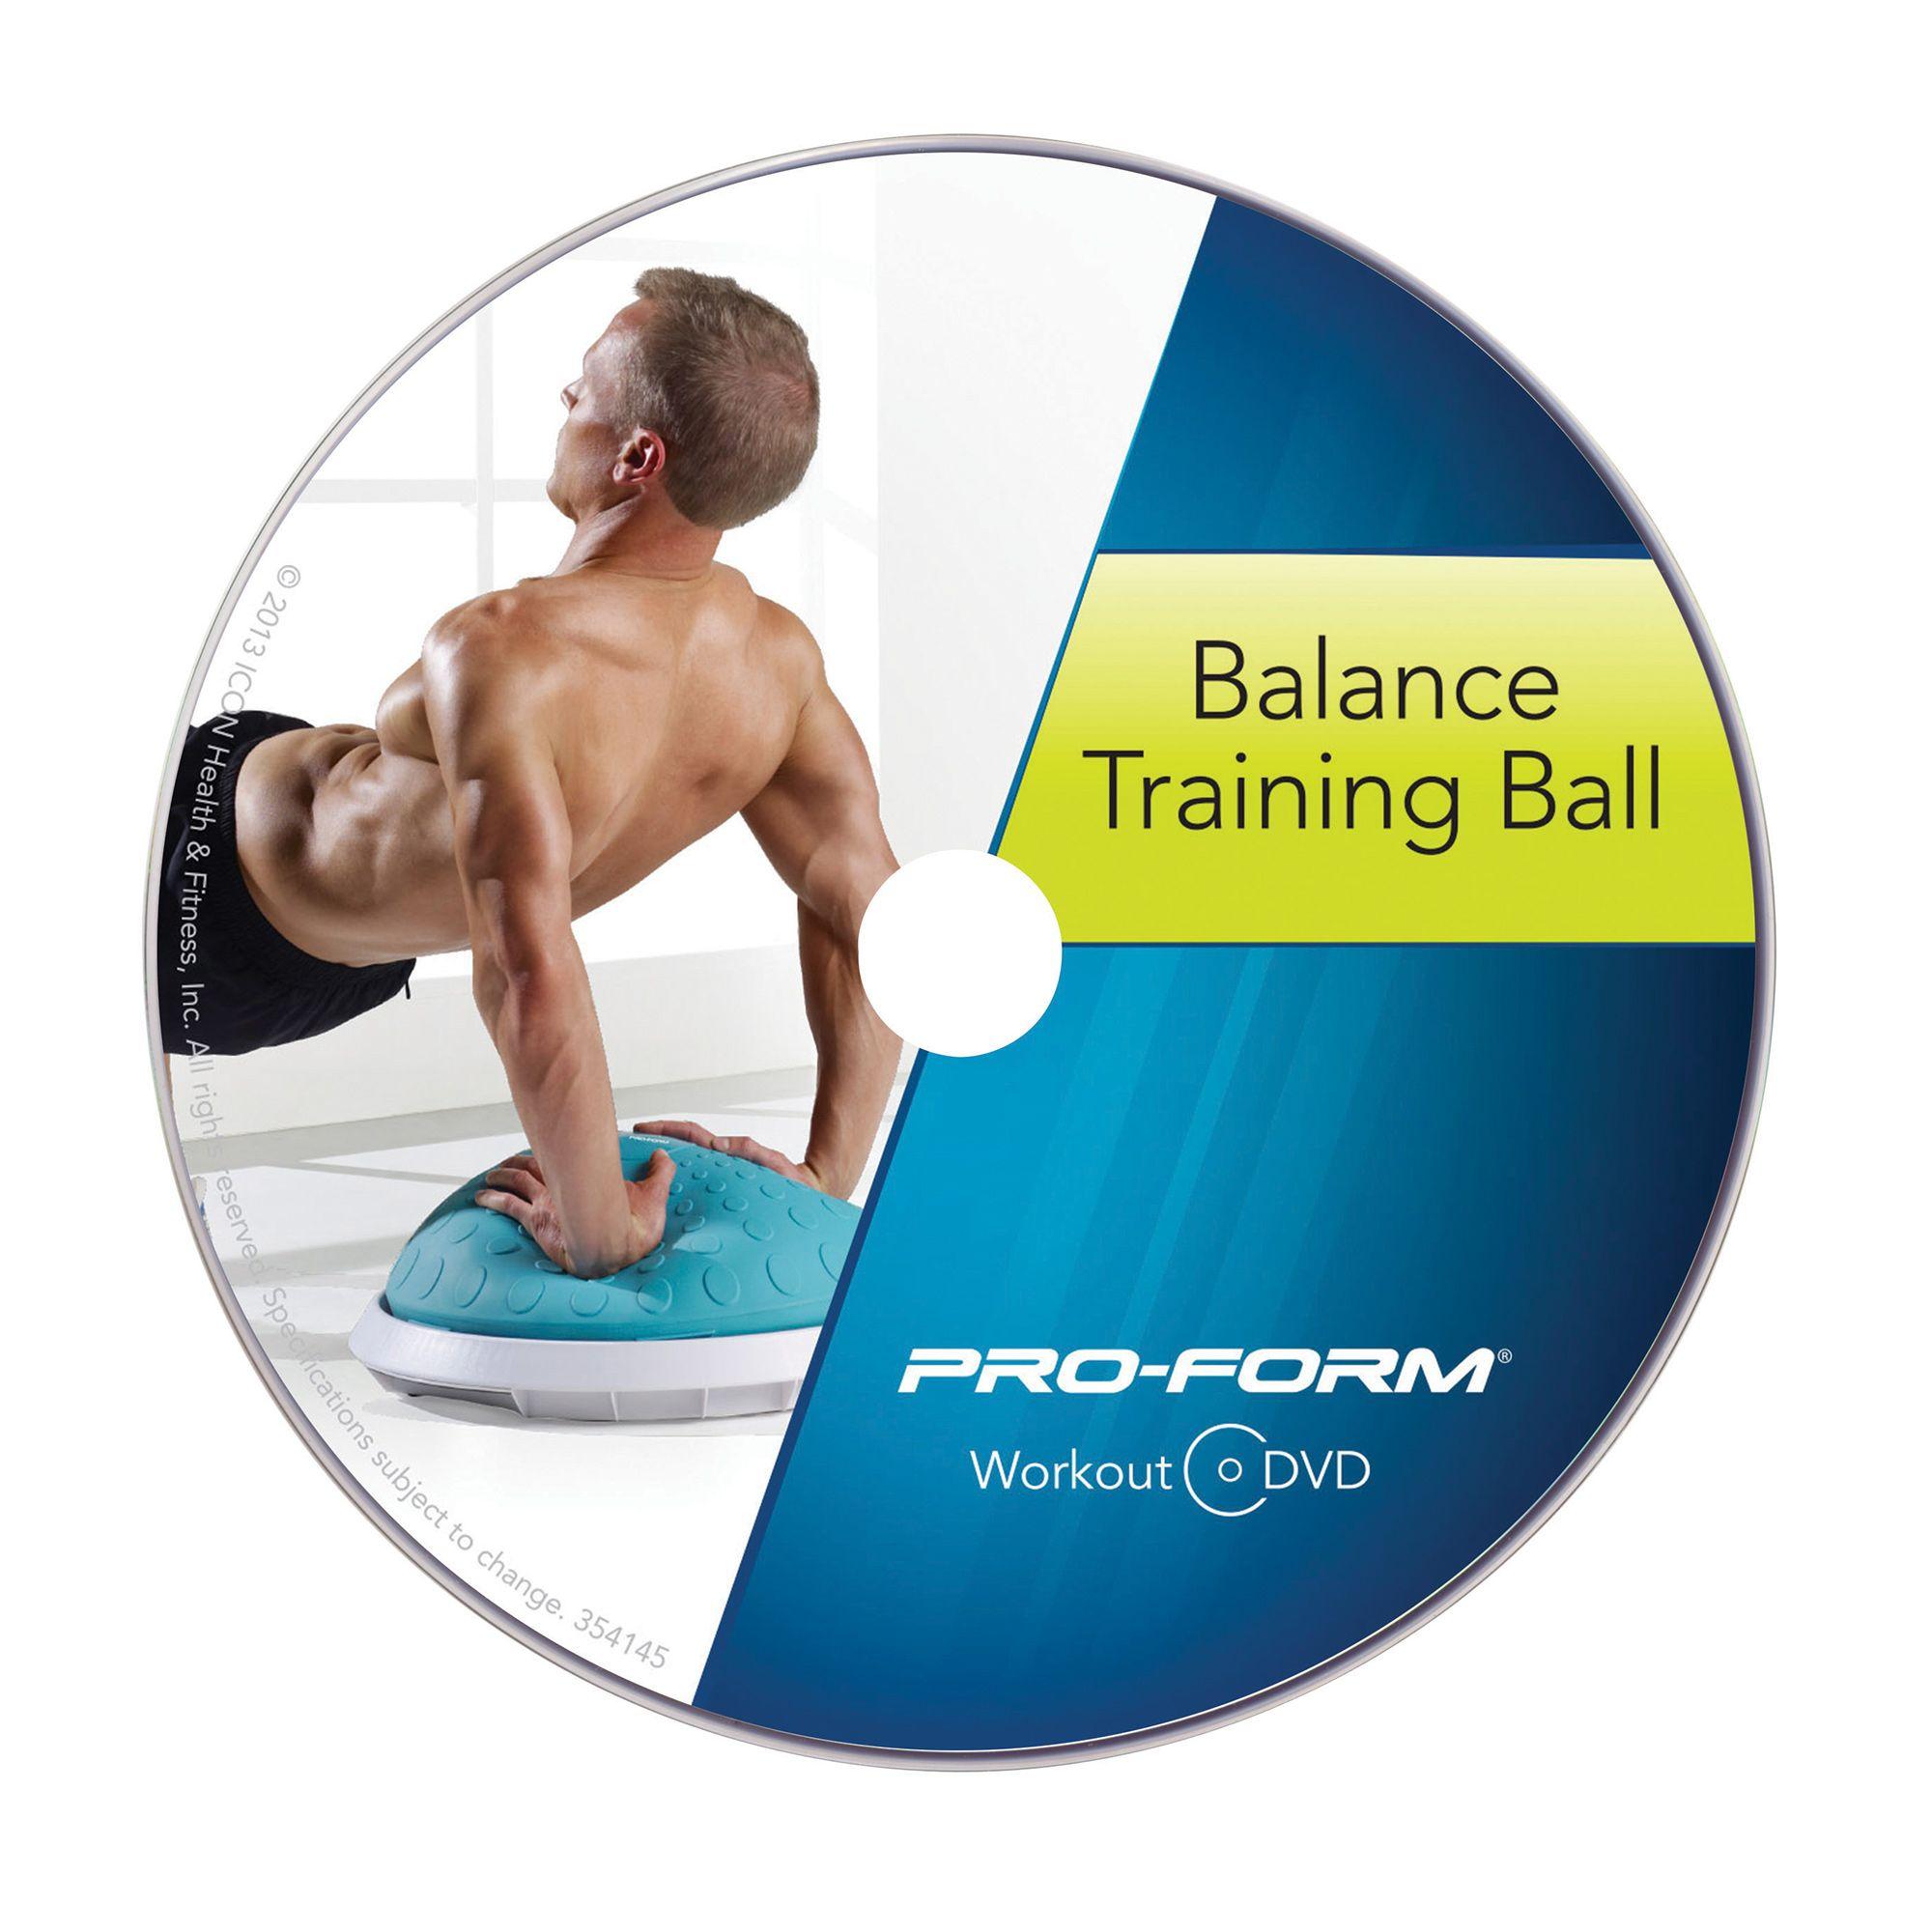 Balance Ball Dvd: ProForm Balance Training Ball